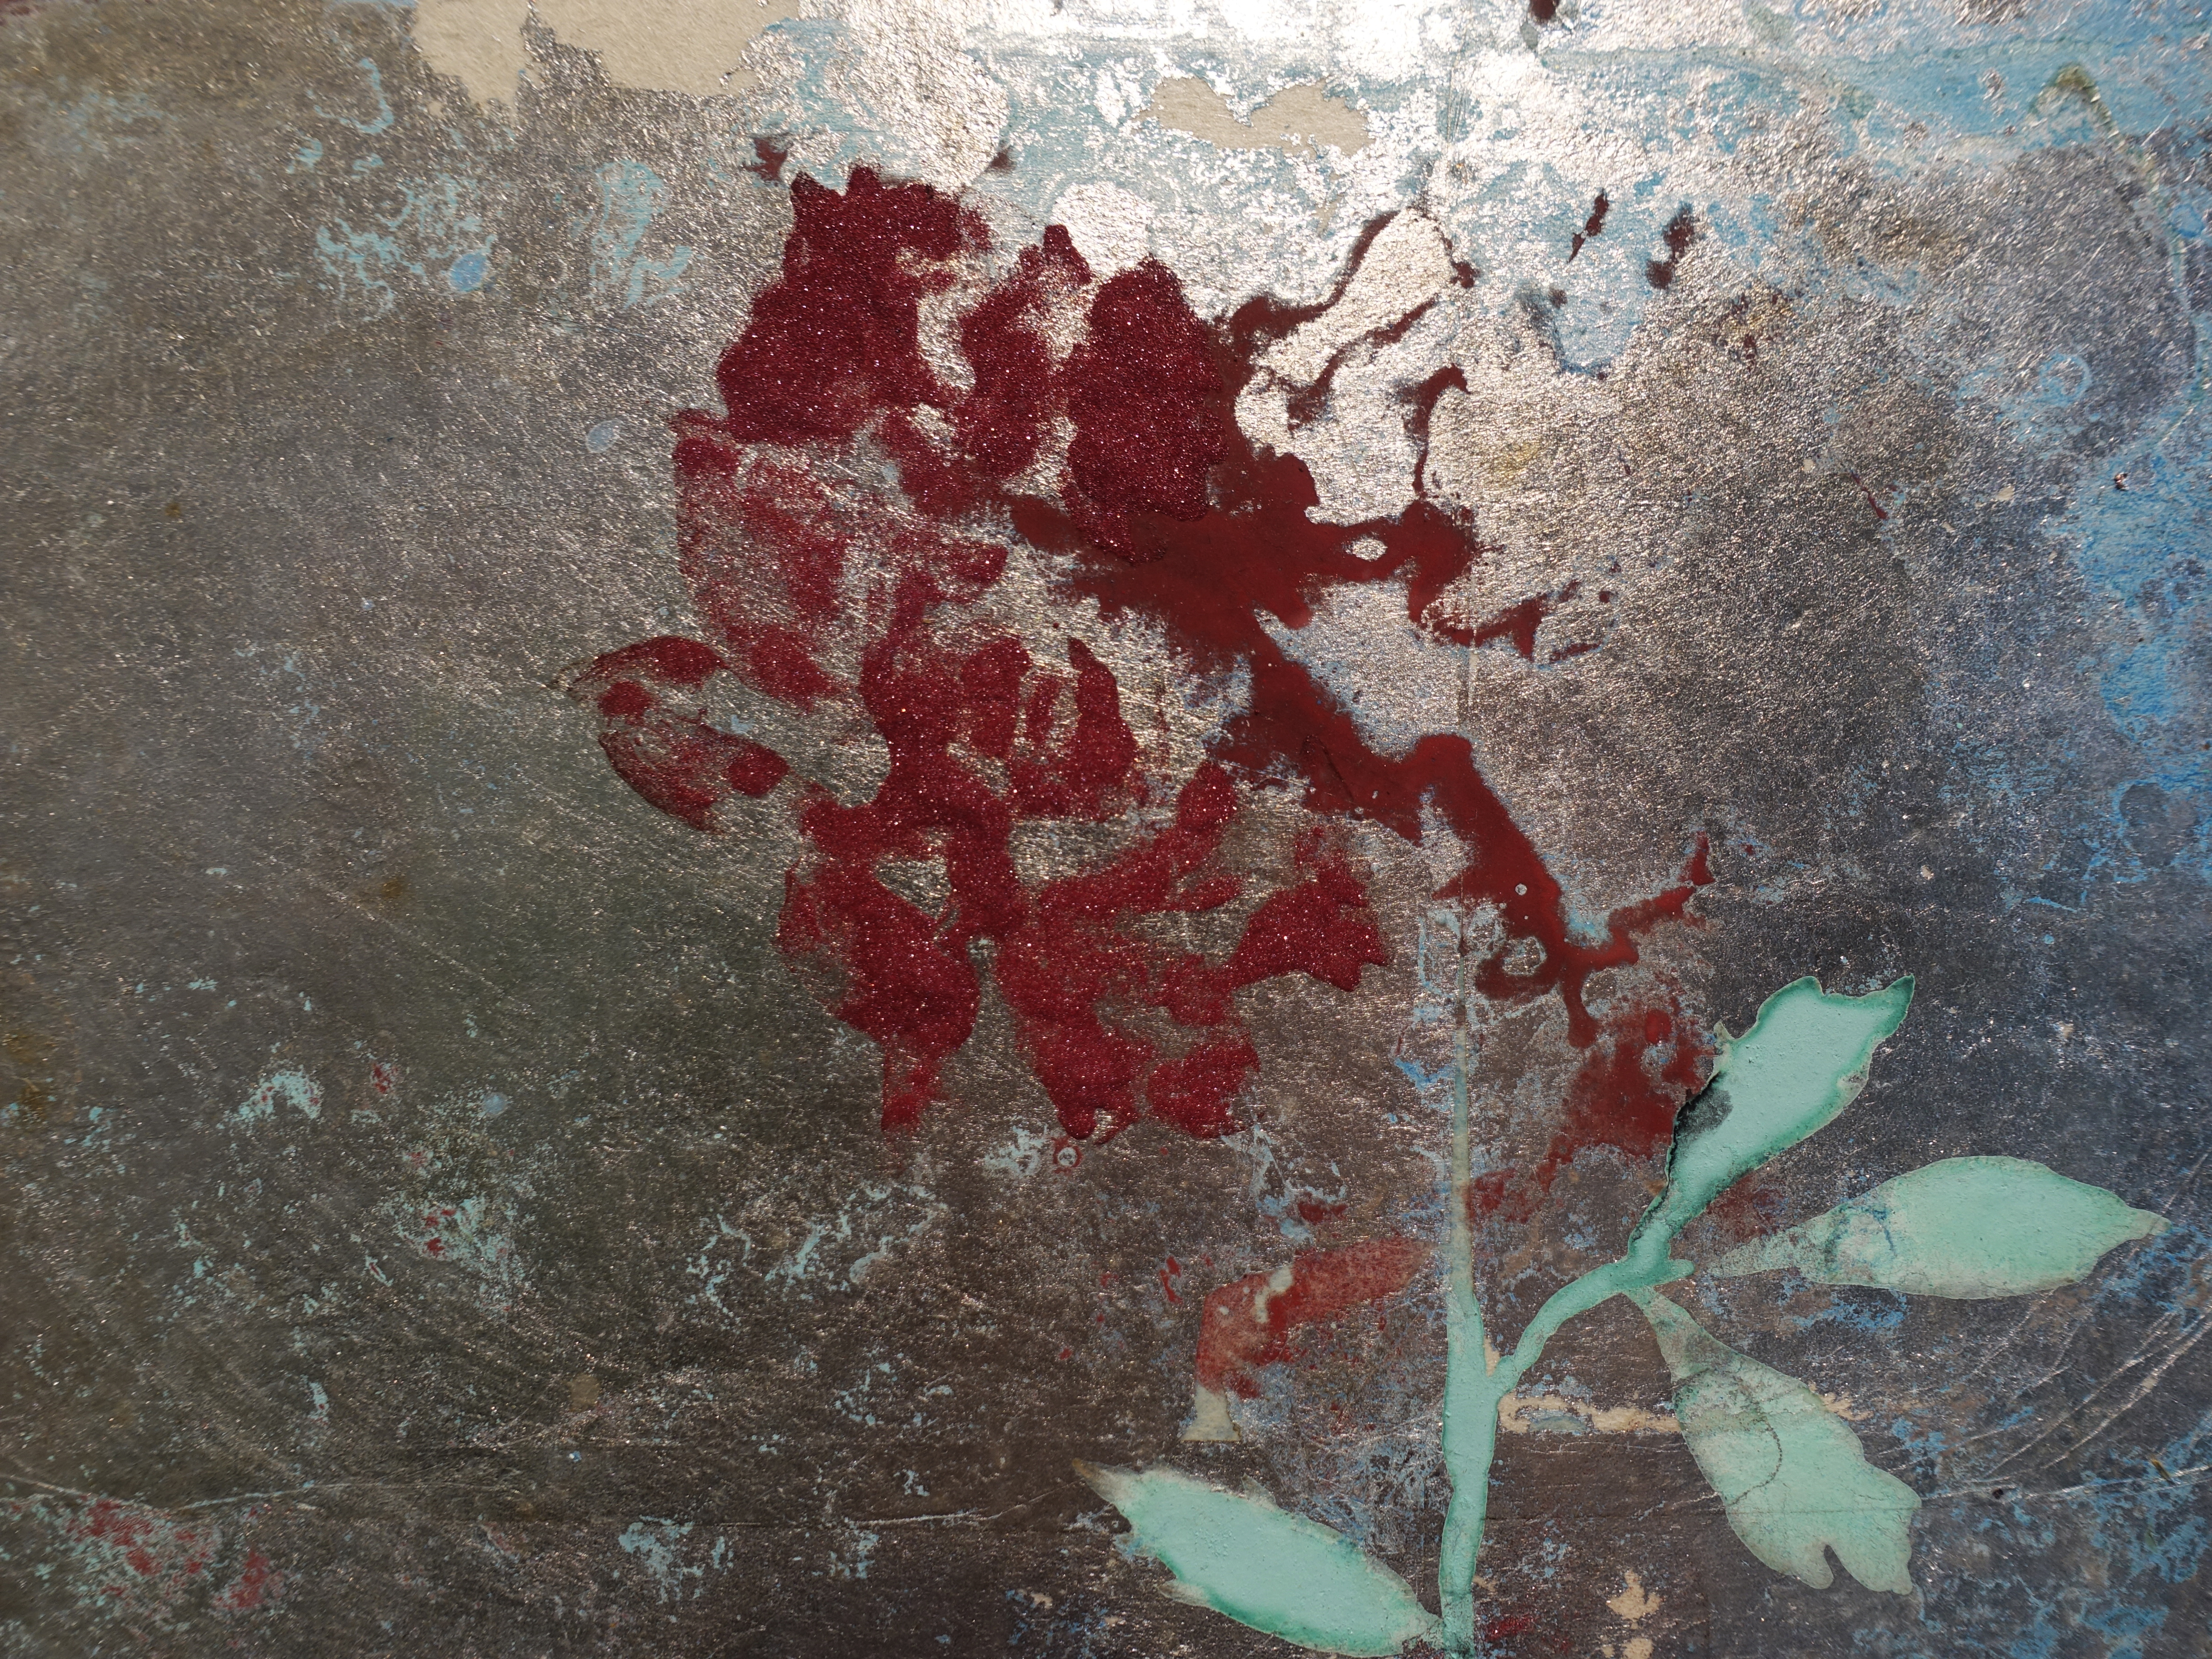 Makoto Fujimura,《Silver Rose》細節,25.5 x 20.5 cm,天然礦物顏料、銀、雲肌紙,2016。